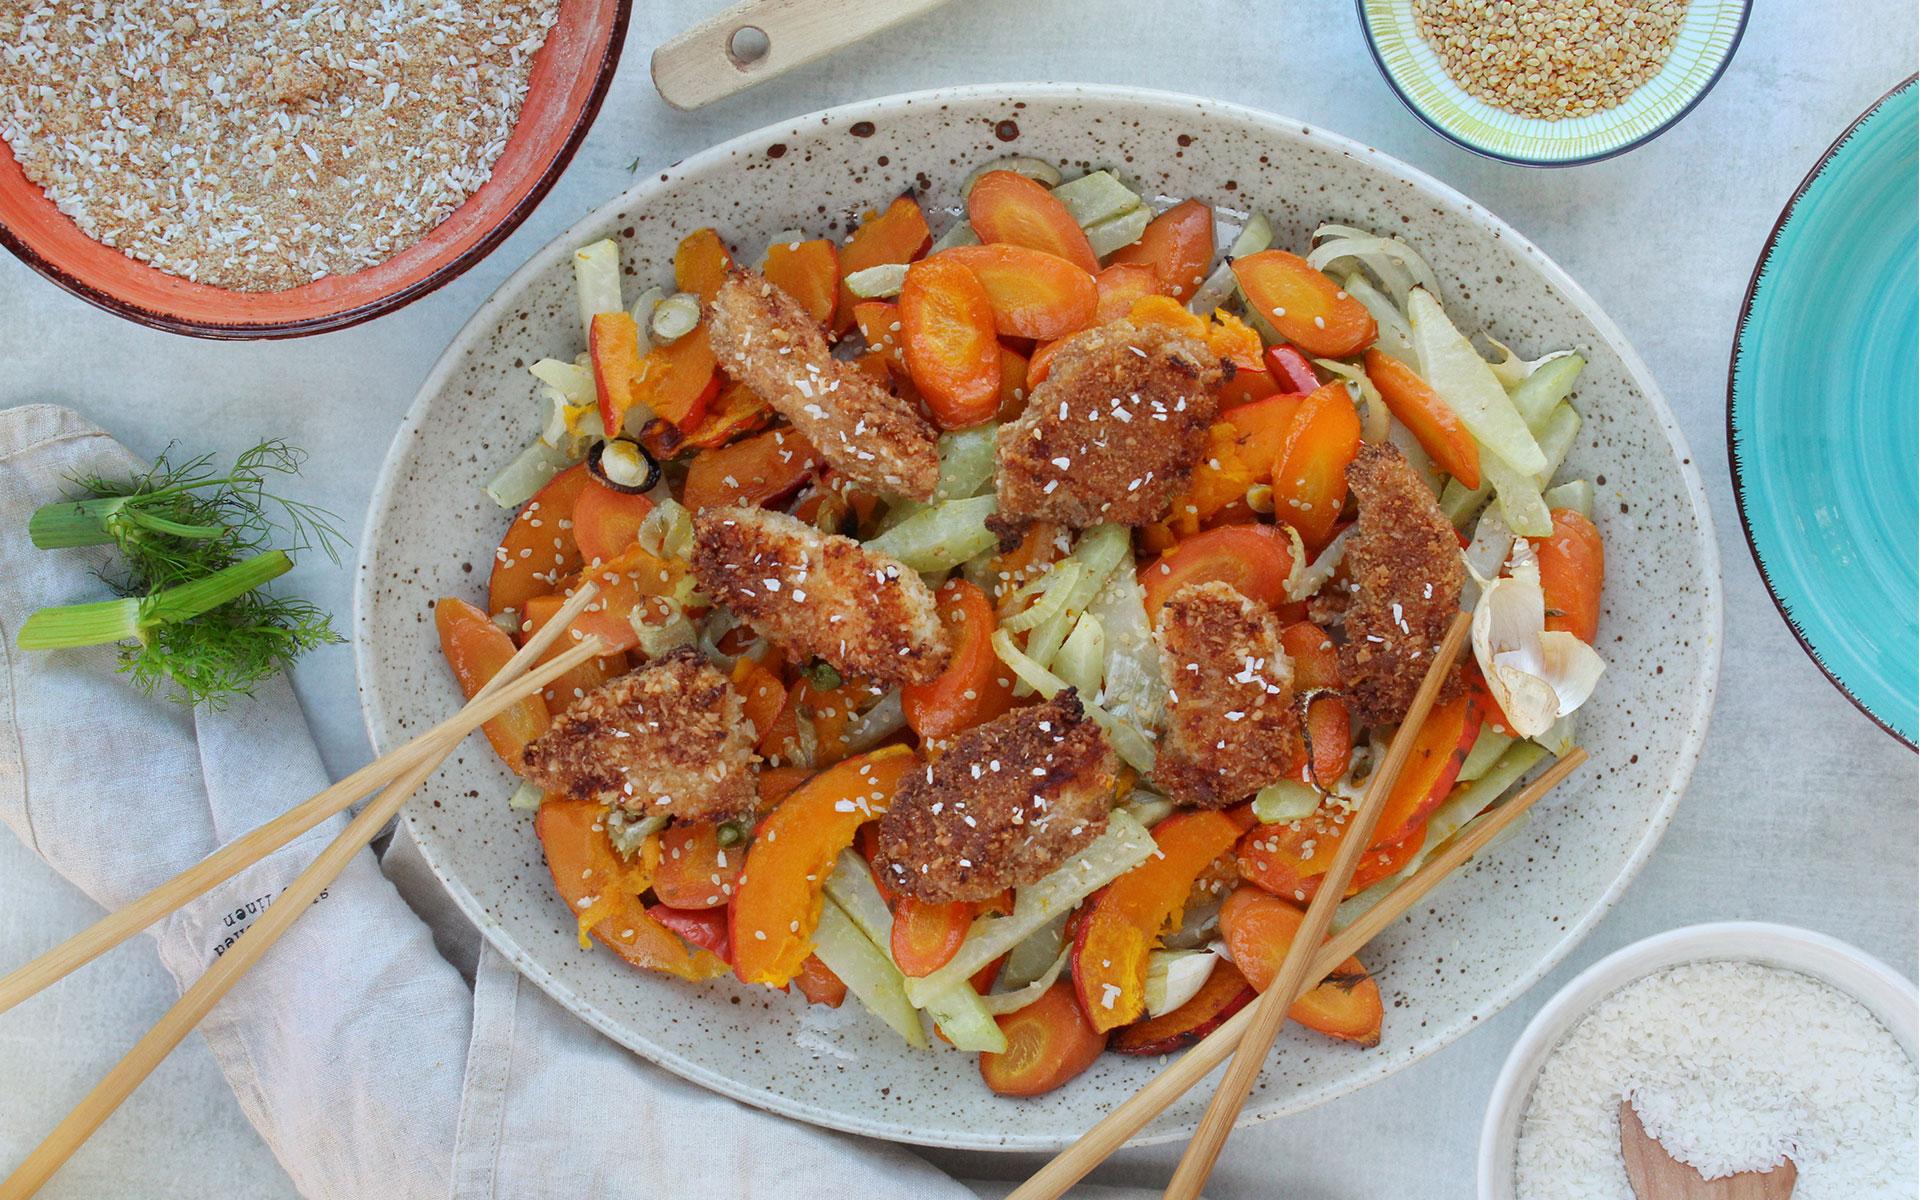 Kokos Hendl Schnitzel auf Asia-Ofengemüse